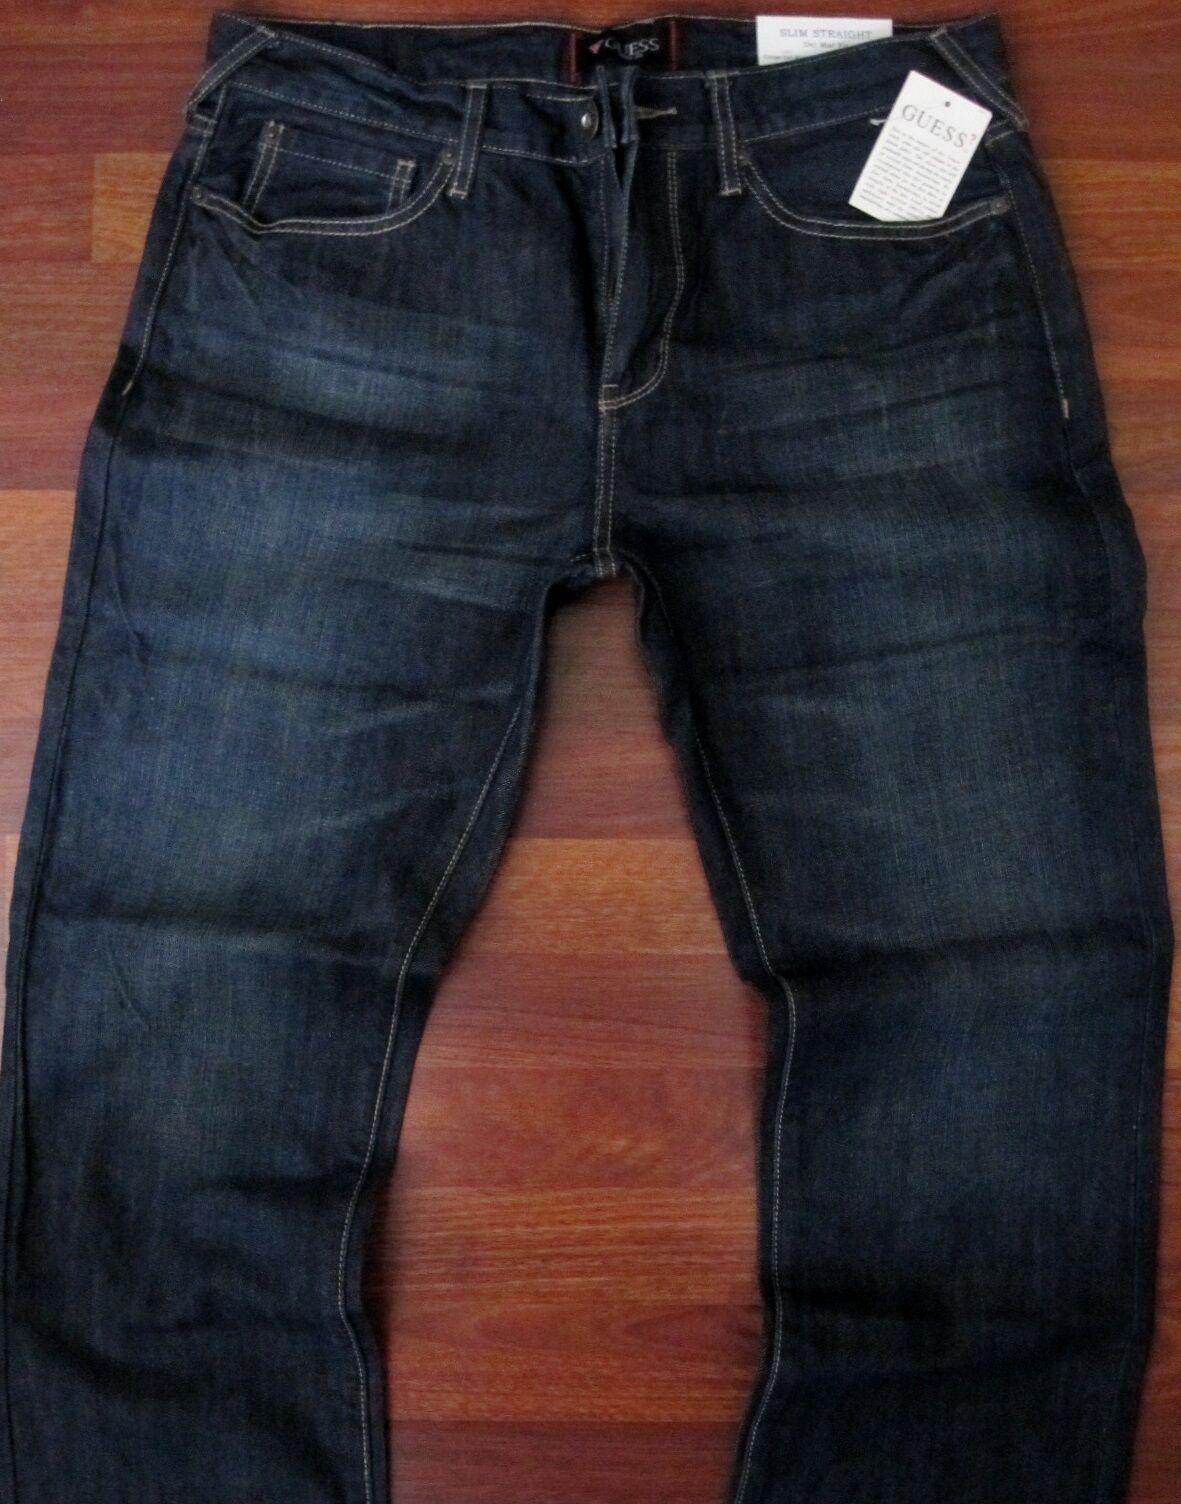 Guess Slim Straight Leg Jeans Men's Size 40 X 30 Sexy Dark distressed Wash NEW